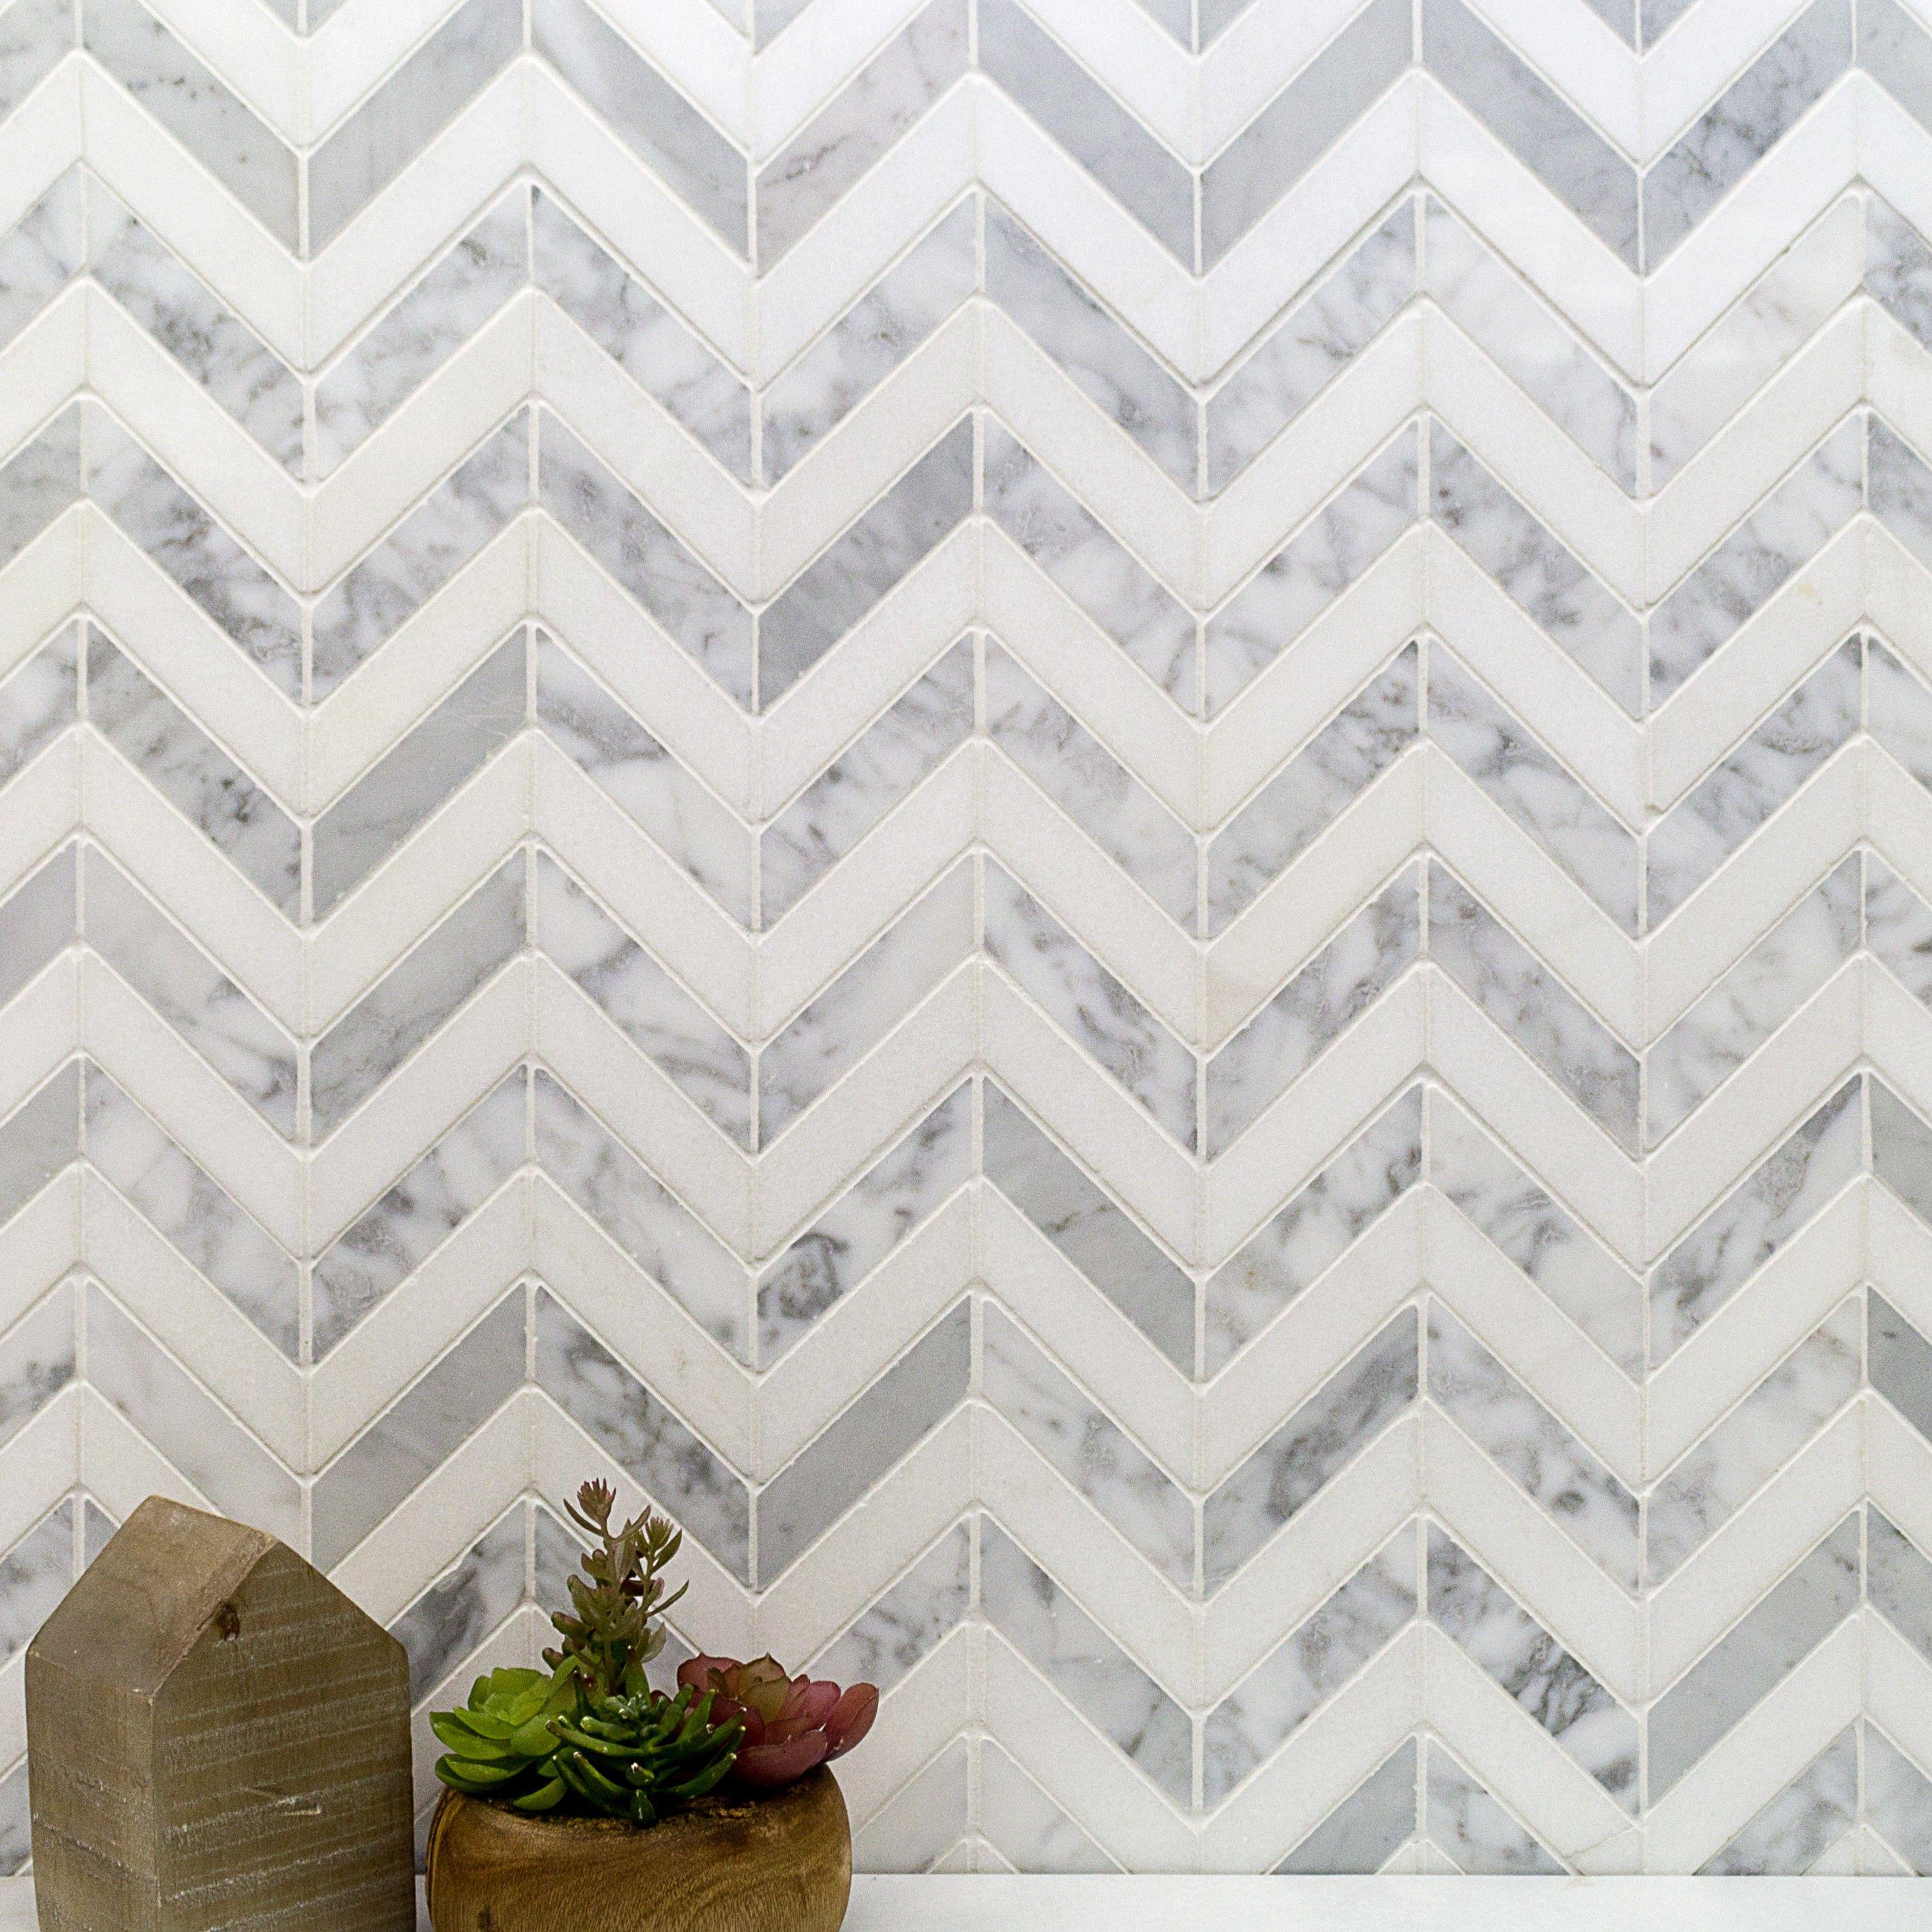 Talon white carrera and thassos marble tile also carrara  tiles marbles girl